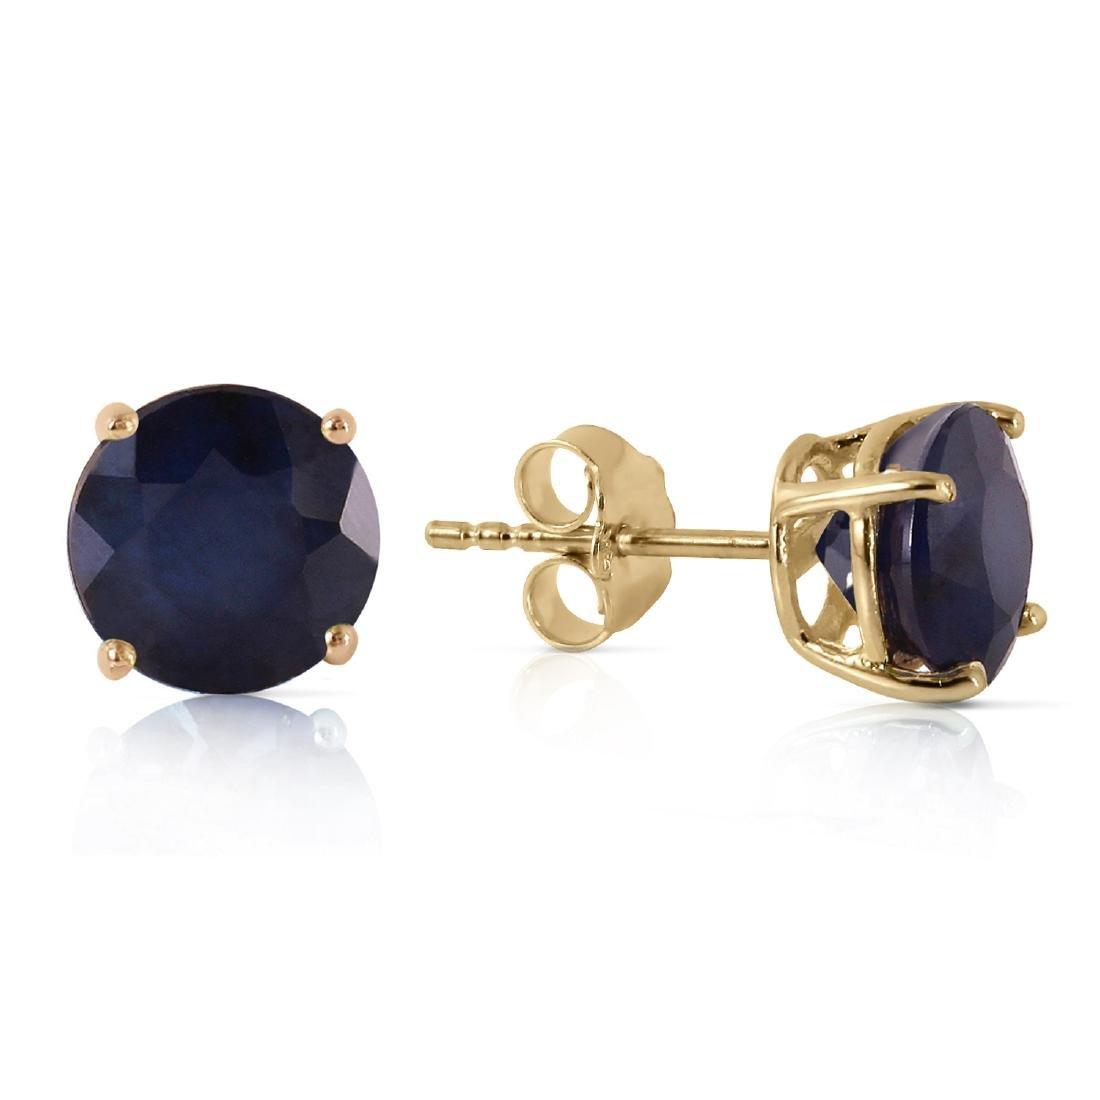 Genuine 3.3 ctw Sapphire Earrings Jewelry 14KT Yellow